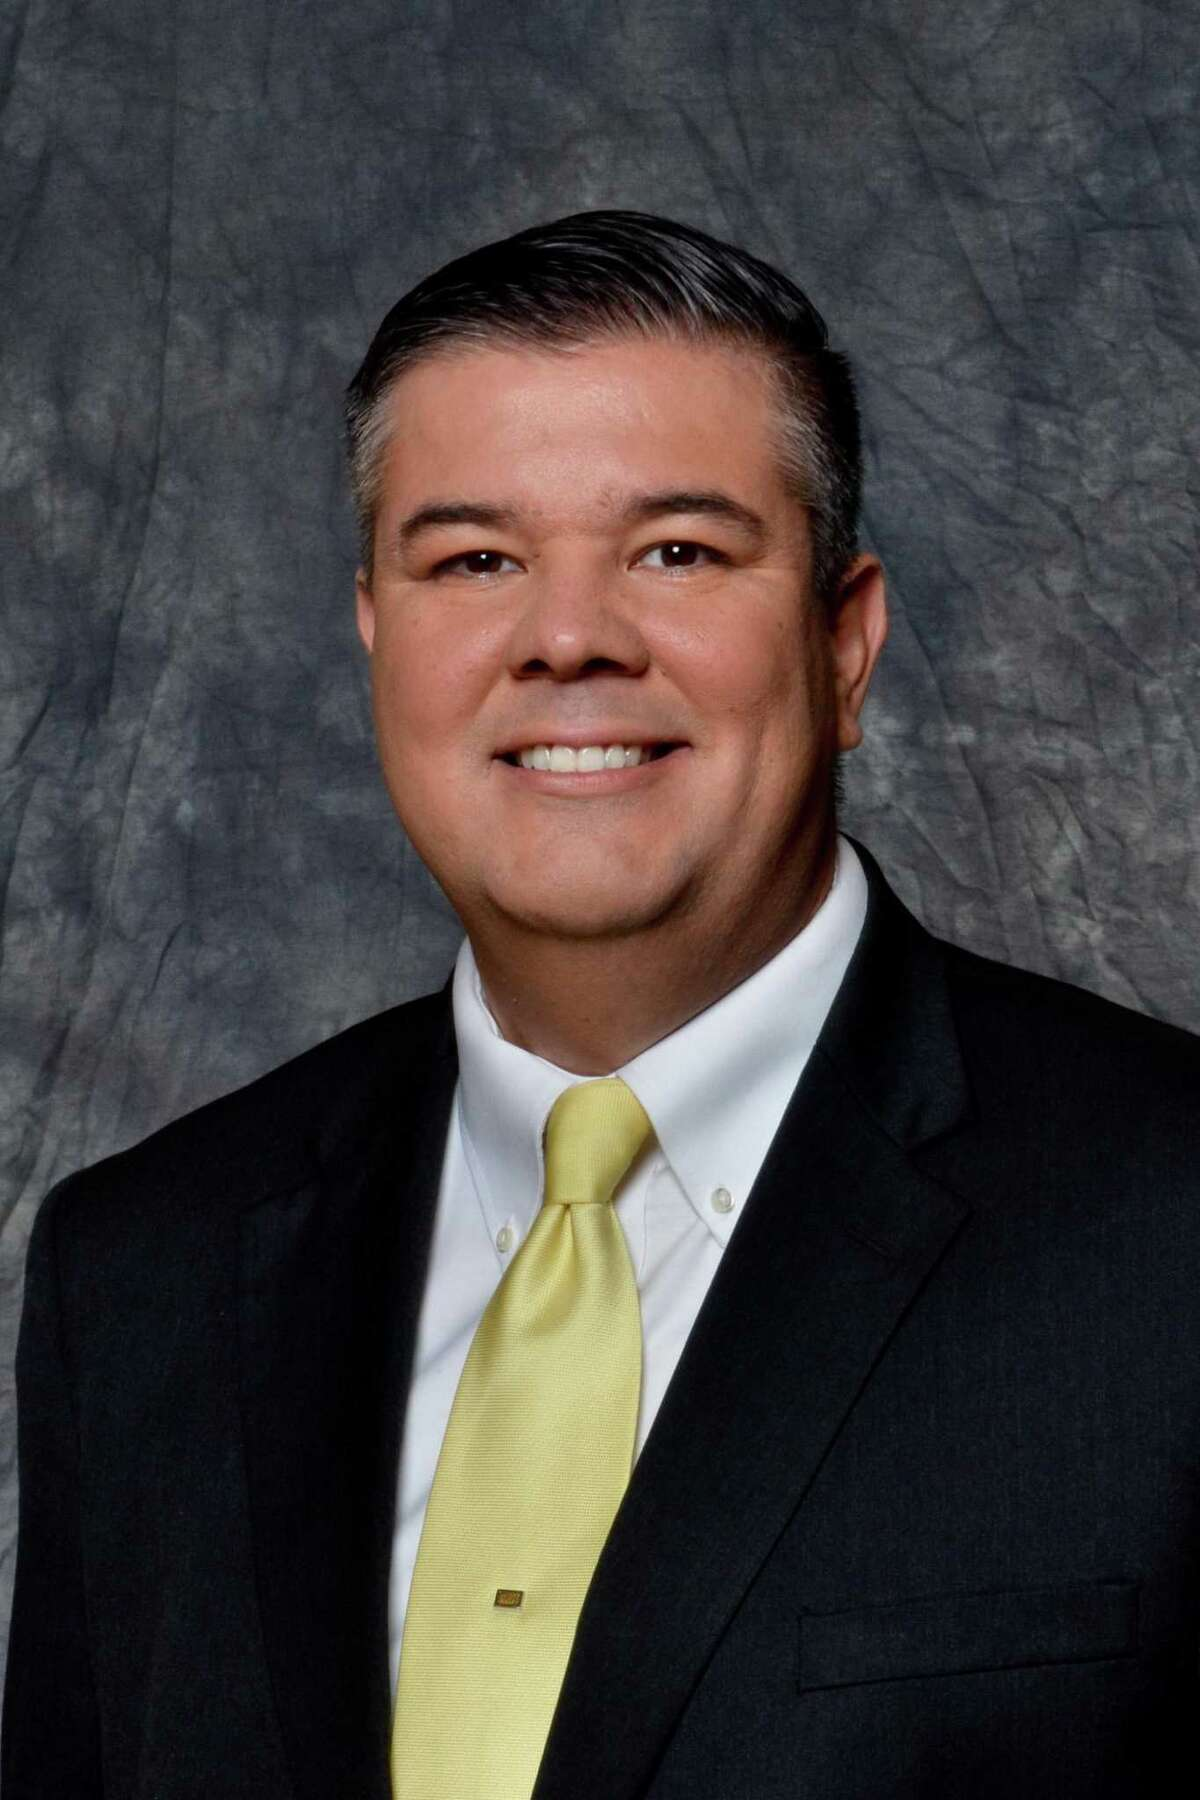 Robert Garza is president of Palo Alto College.